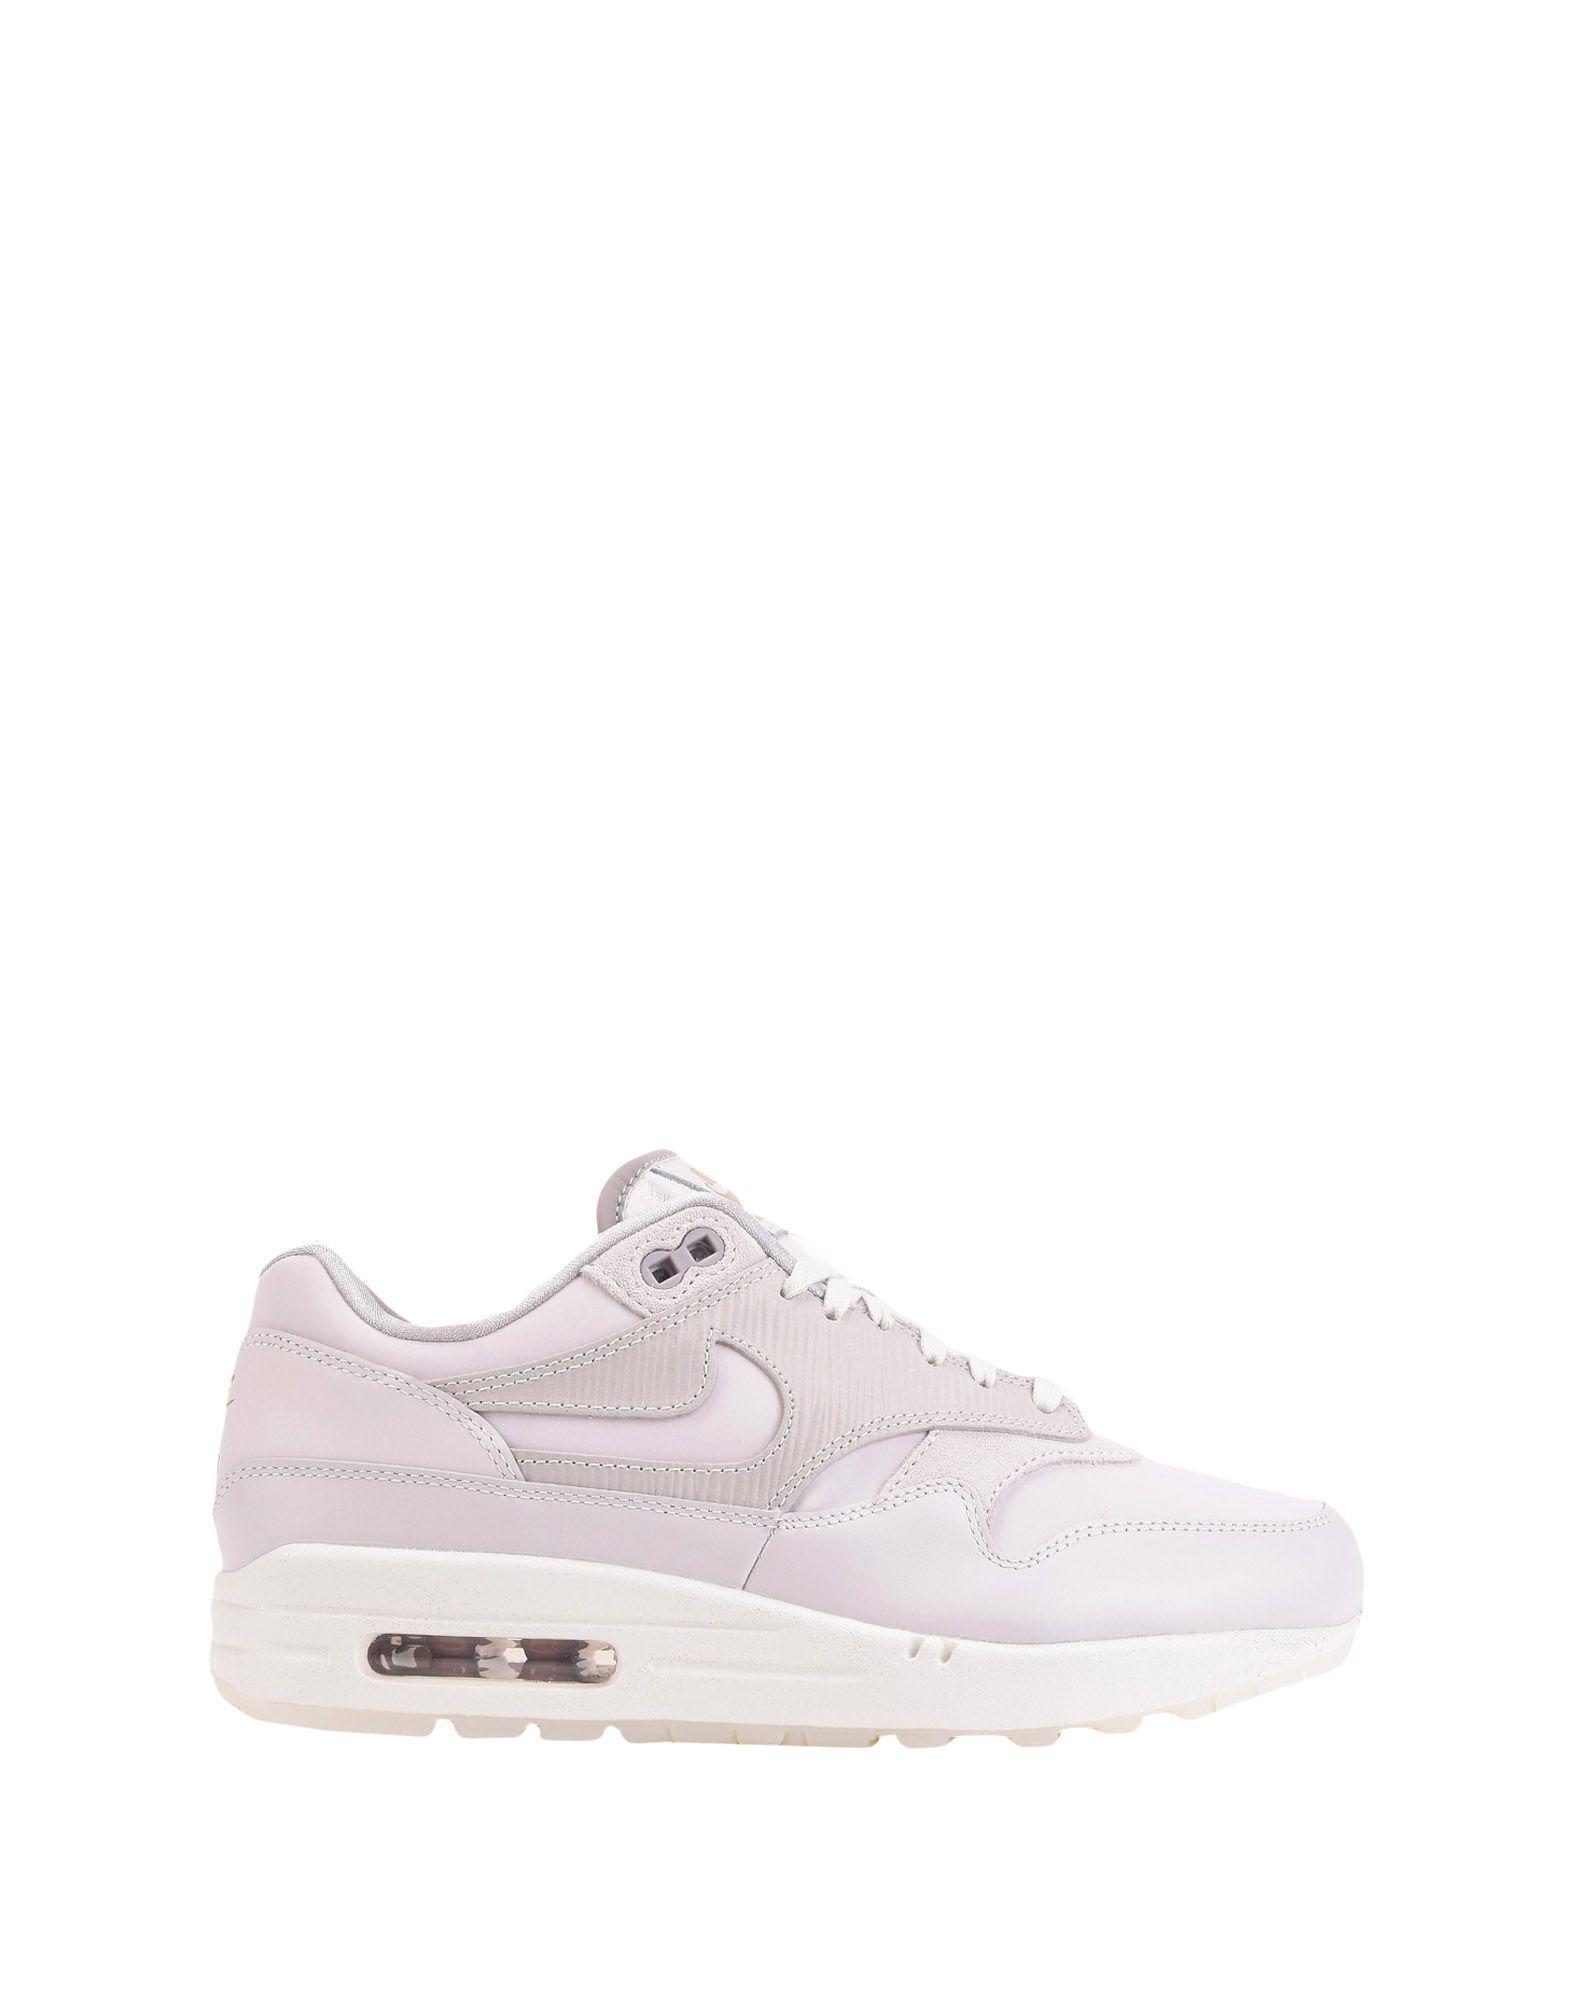 Nike Suede Low-tops & Sneakers in Light Pink (Pink)